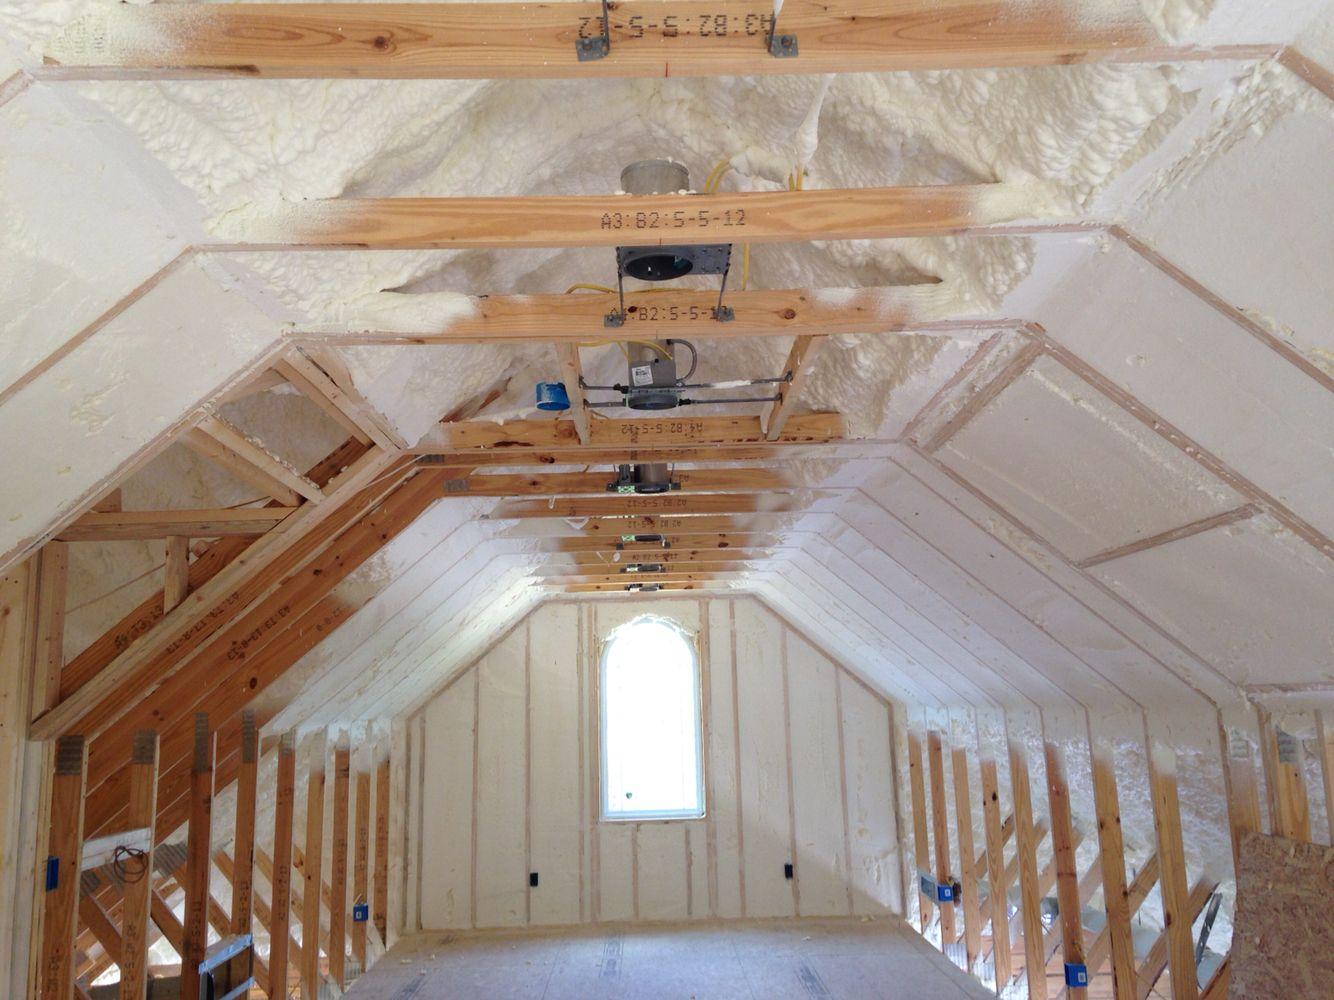 Spray Foam Insulation In Bonus Room Spray Foam Insulation Foam Insulation Craftsman Style Home